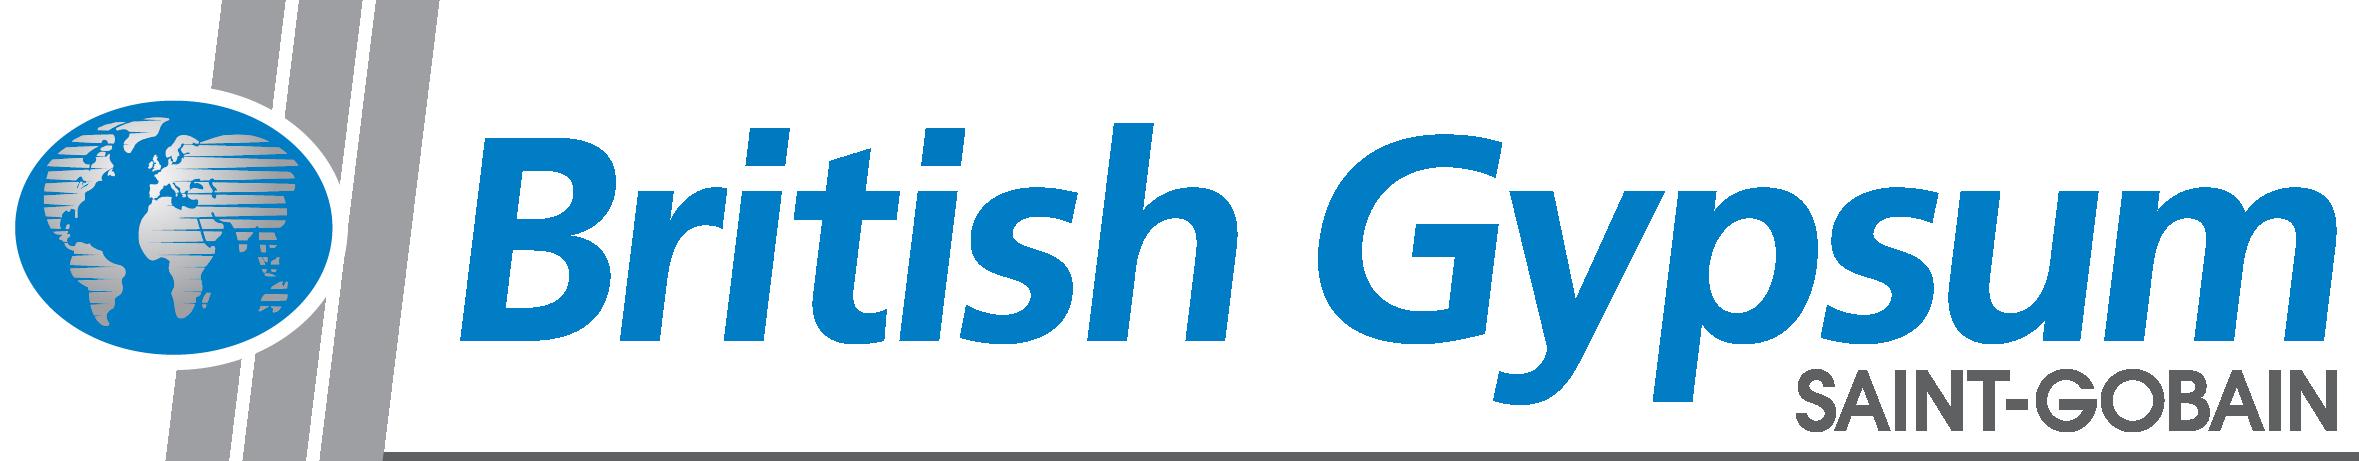 British_Gypsum_Logo.png